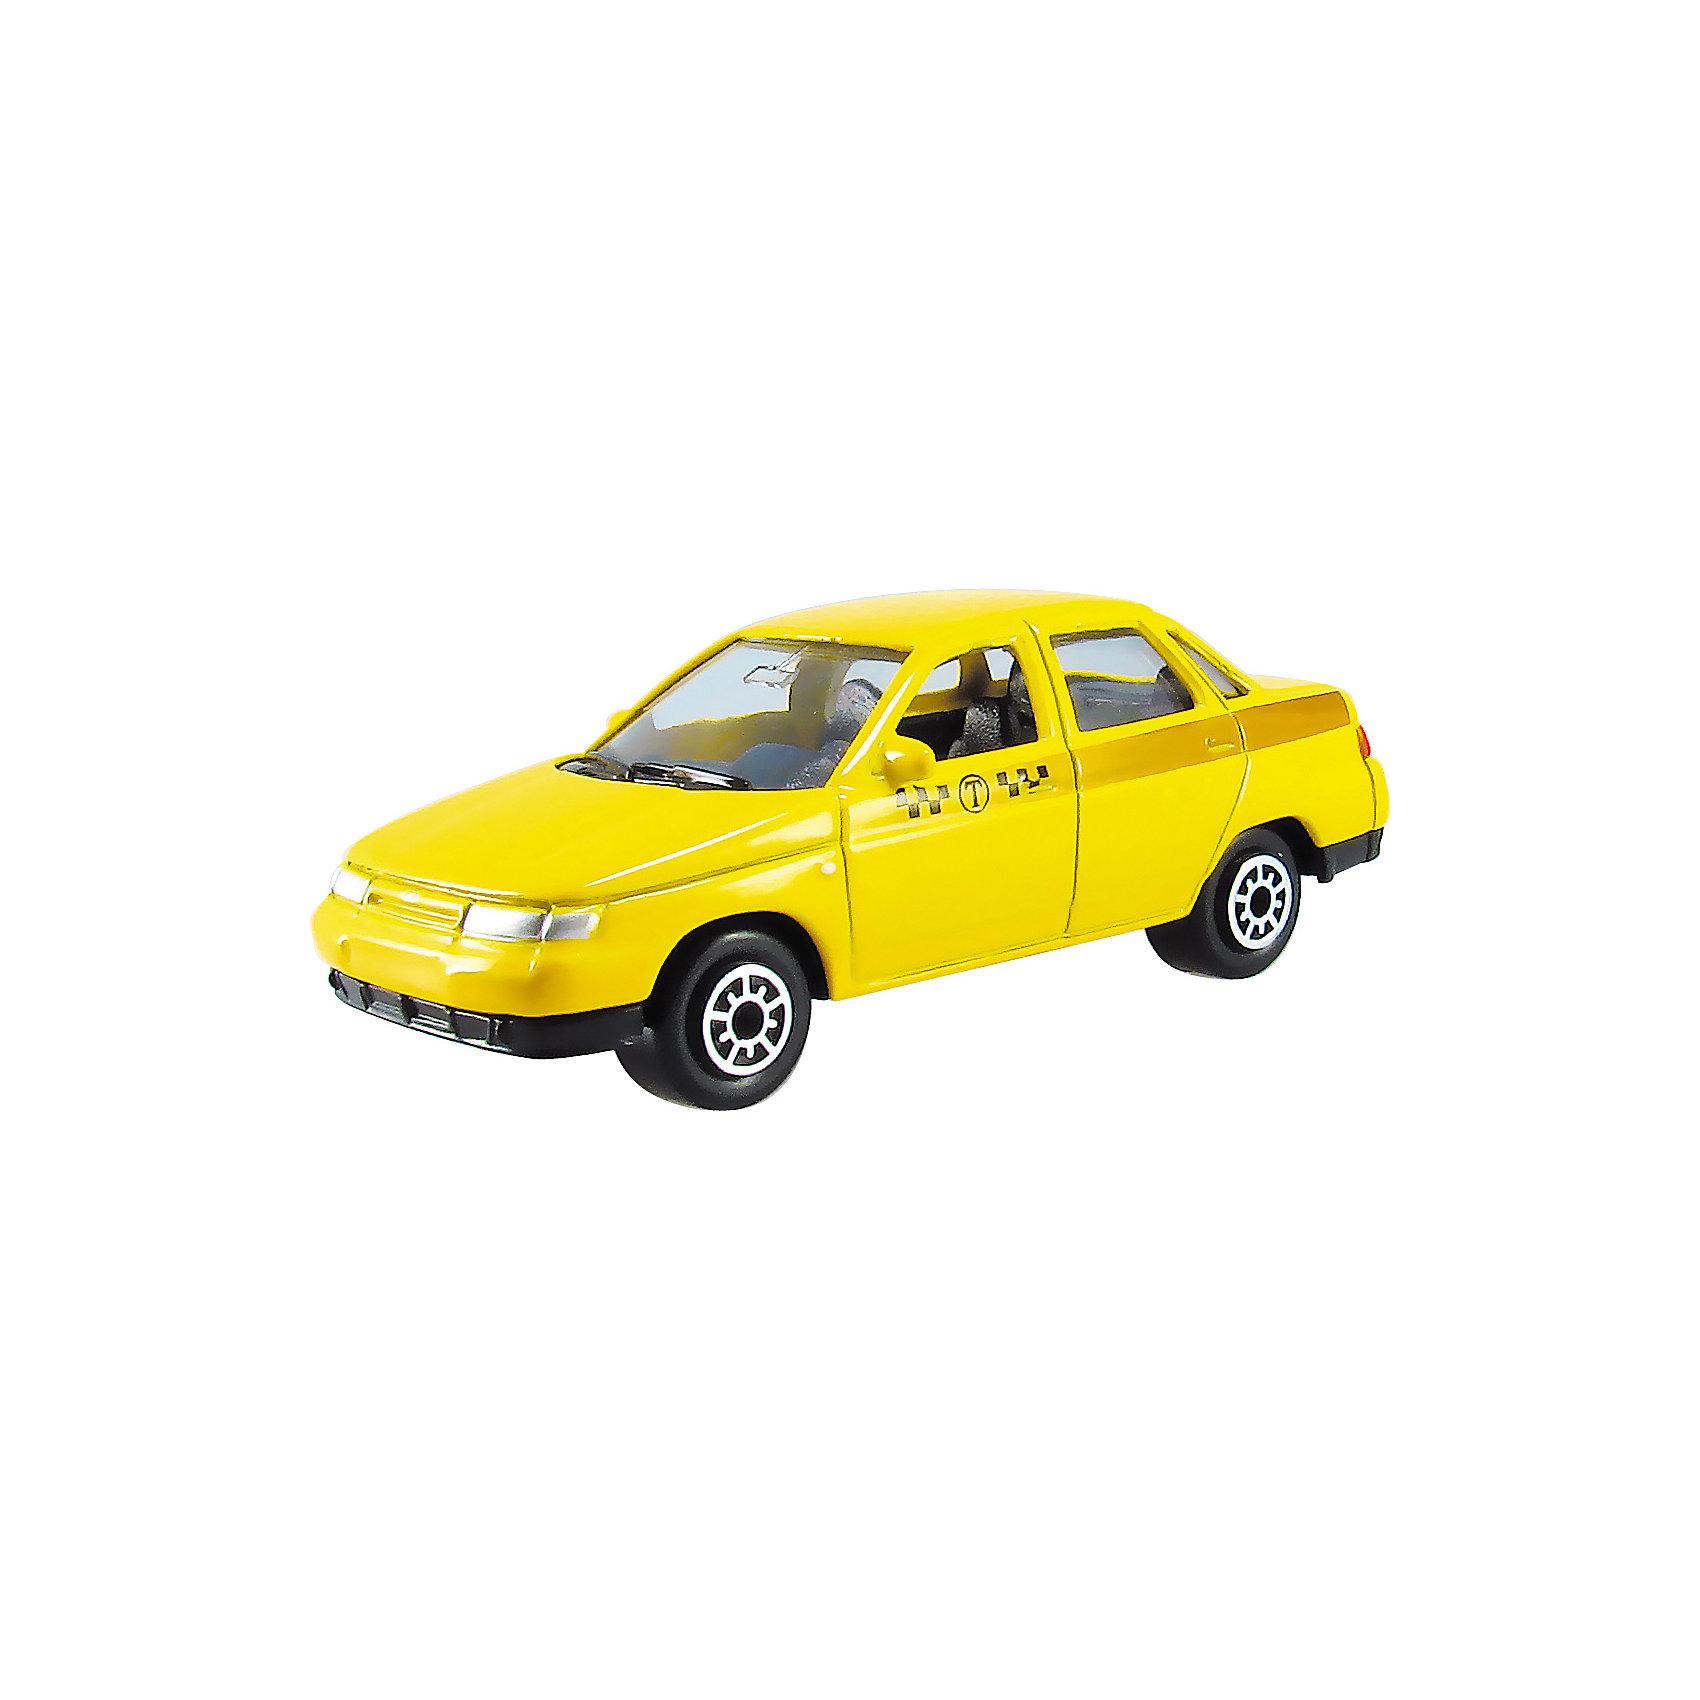 Машинка Lada 110 такси 1:60, AutotimeМашинки<br><br><br>Ширина мм: 100<br>Глубина мм: 40<br>Высота мм: 40<br>Вес г: 16<br>Возраст от месяцев: 36<br>Возраст до месяцев: 2147483647<br>Пол: Мужской<br>Возраст: Детский<br>SKU: 5584013